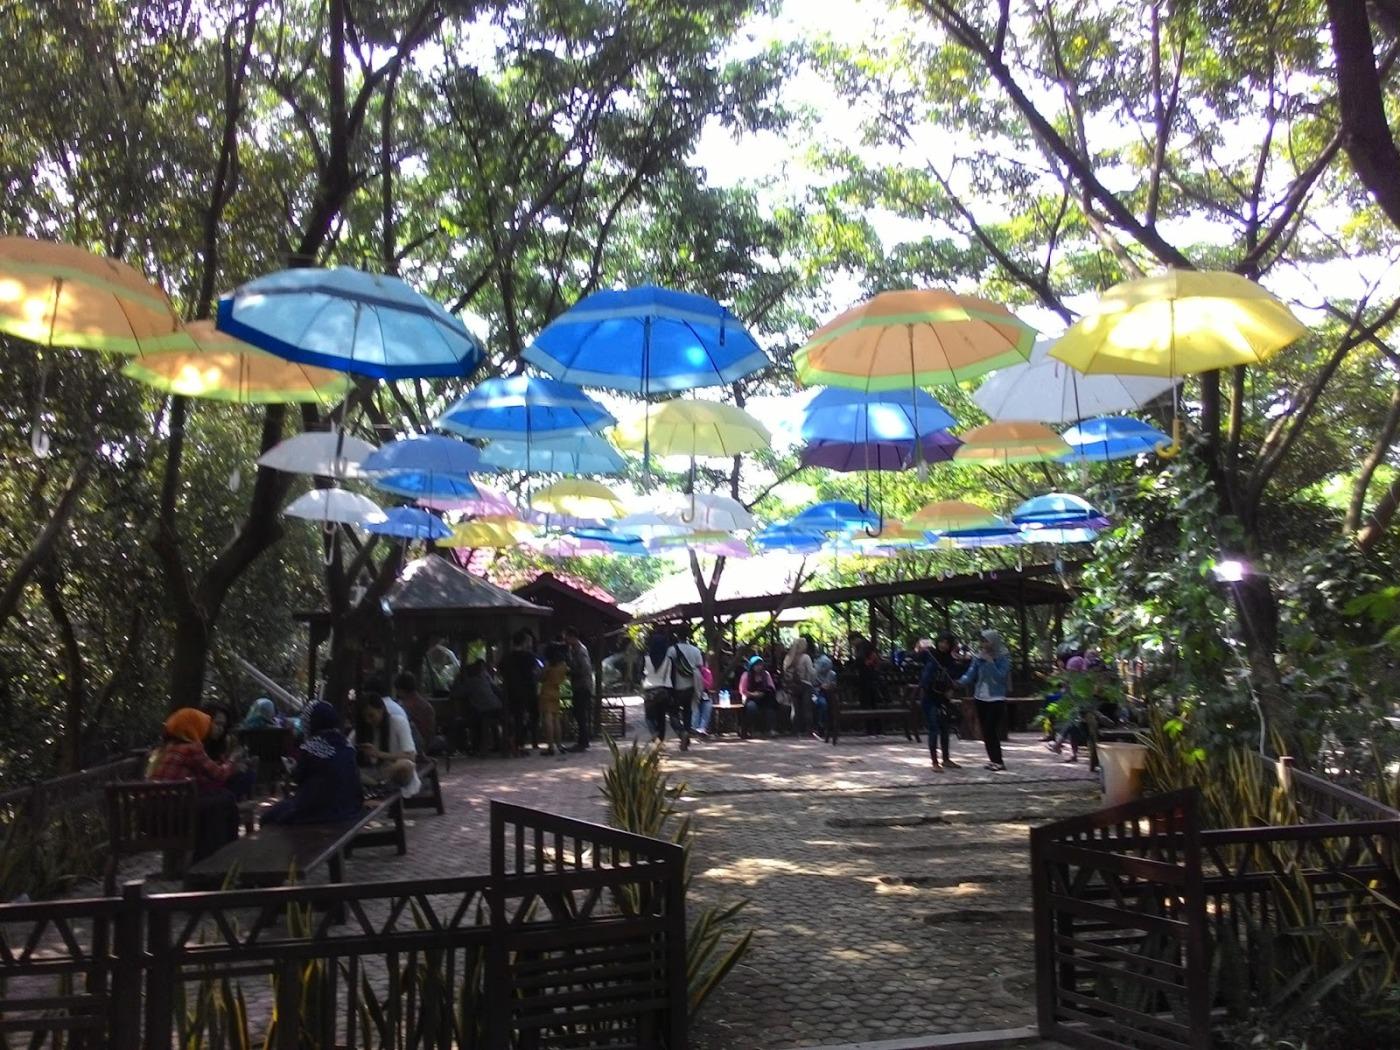 Pesona Wisata Alam Hutan Bakau Pantai Indah Kapuk